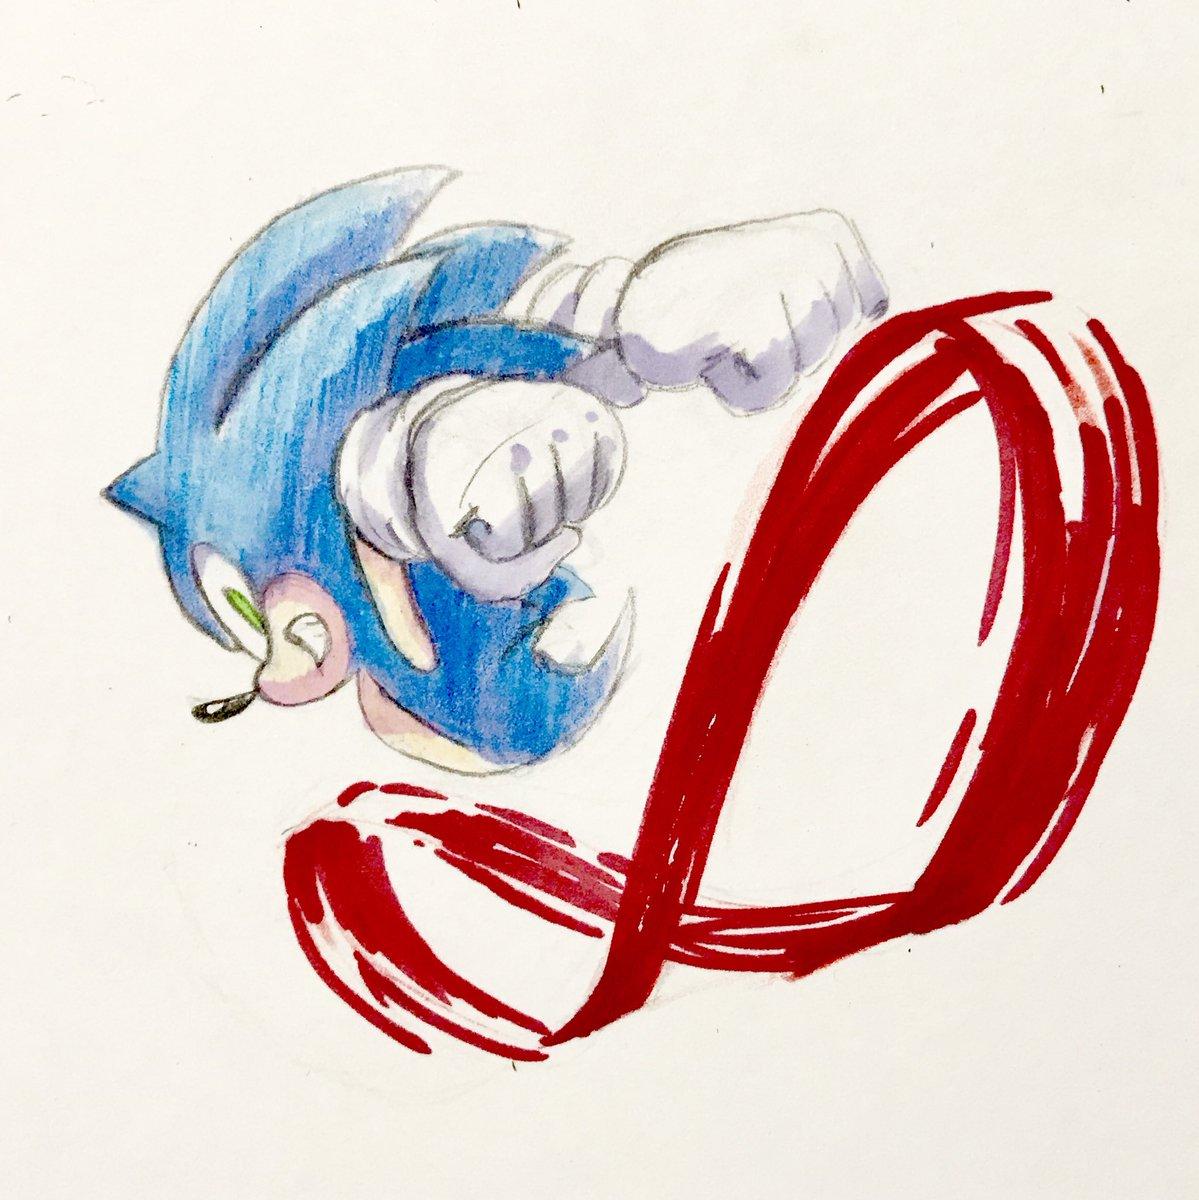 Catch ya later!  #Sonicthehedgehog #sega #art #videogames #drawing<br>http://pic.twitter.com/O5a2Xaz3rJ